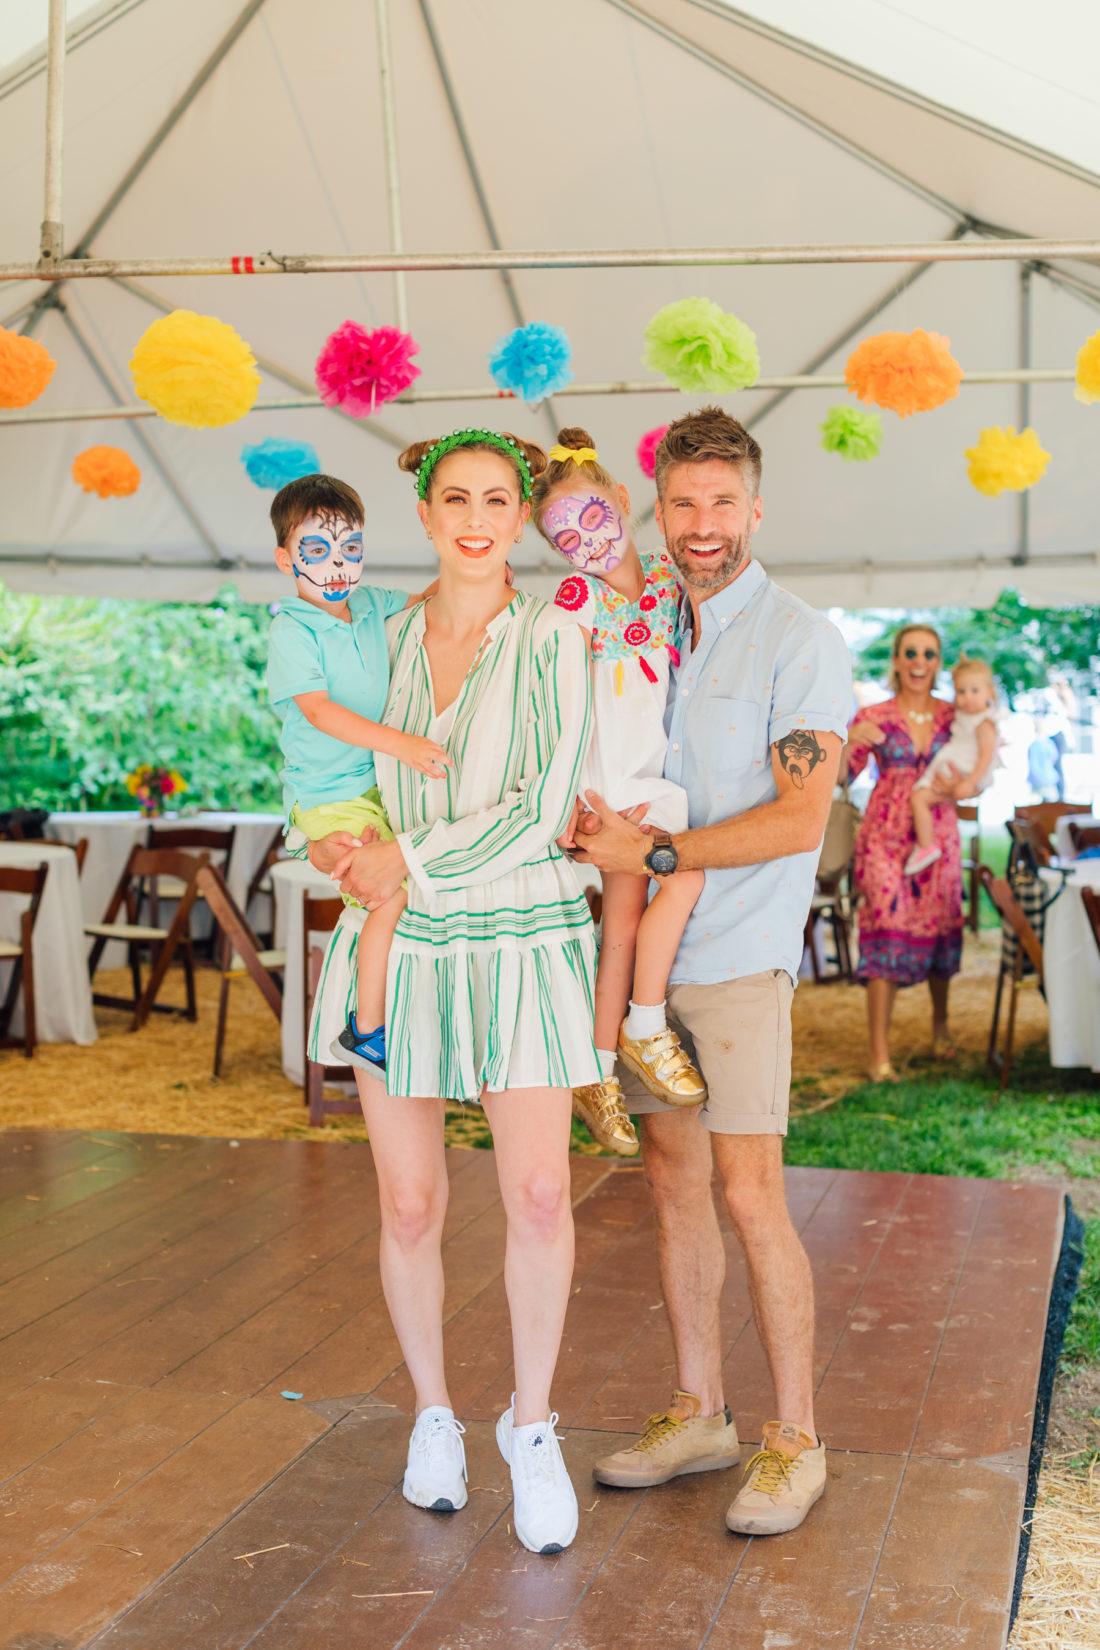 The Martino Family at daughter Marlowe's El Cinco de Marlowe themed 5th birthday fiesta